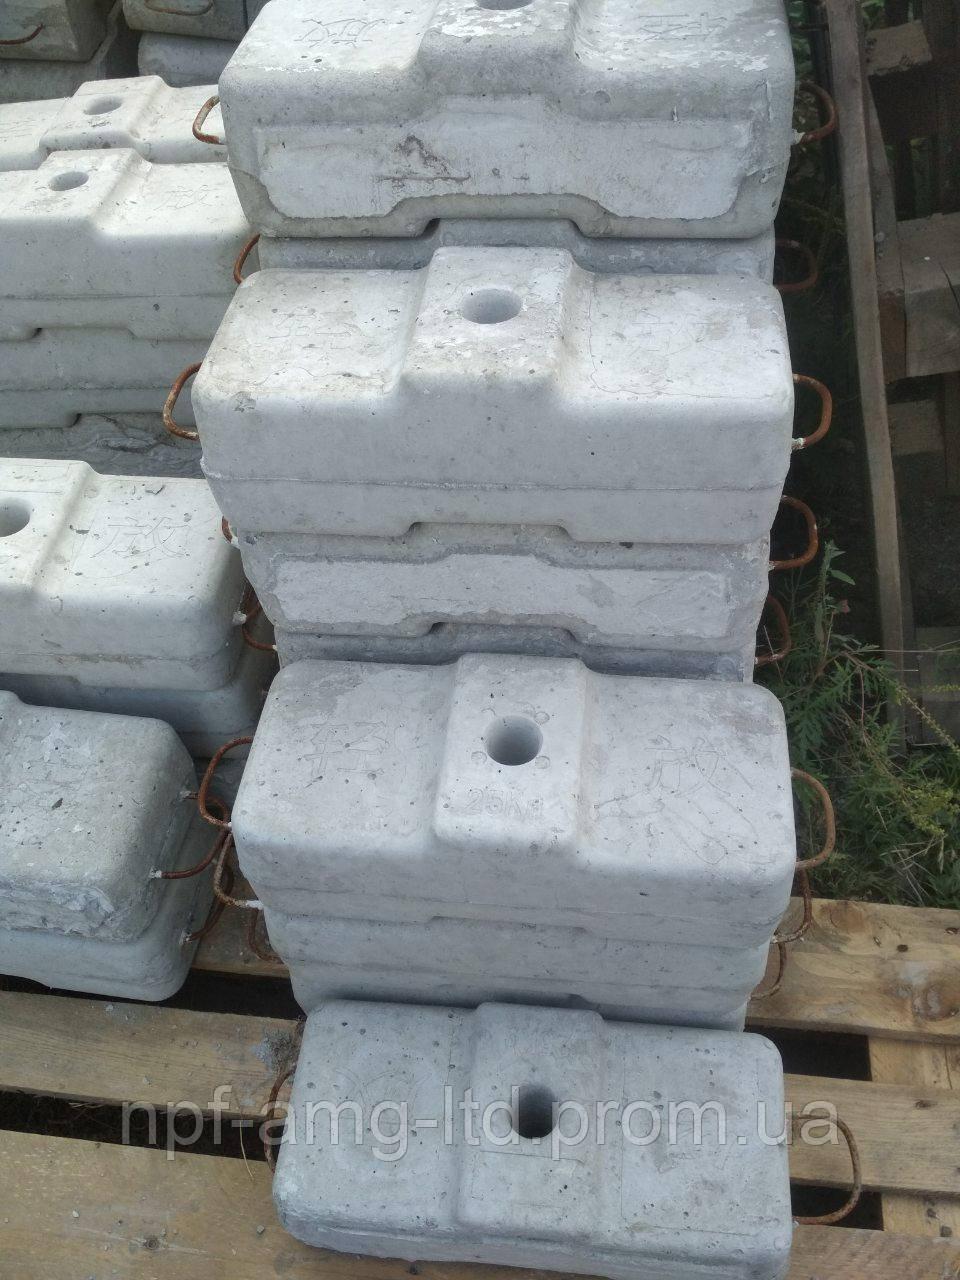 Груз бетона заказать бетон пушкино